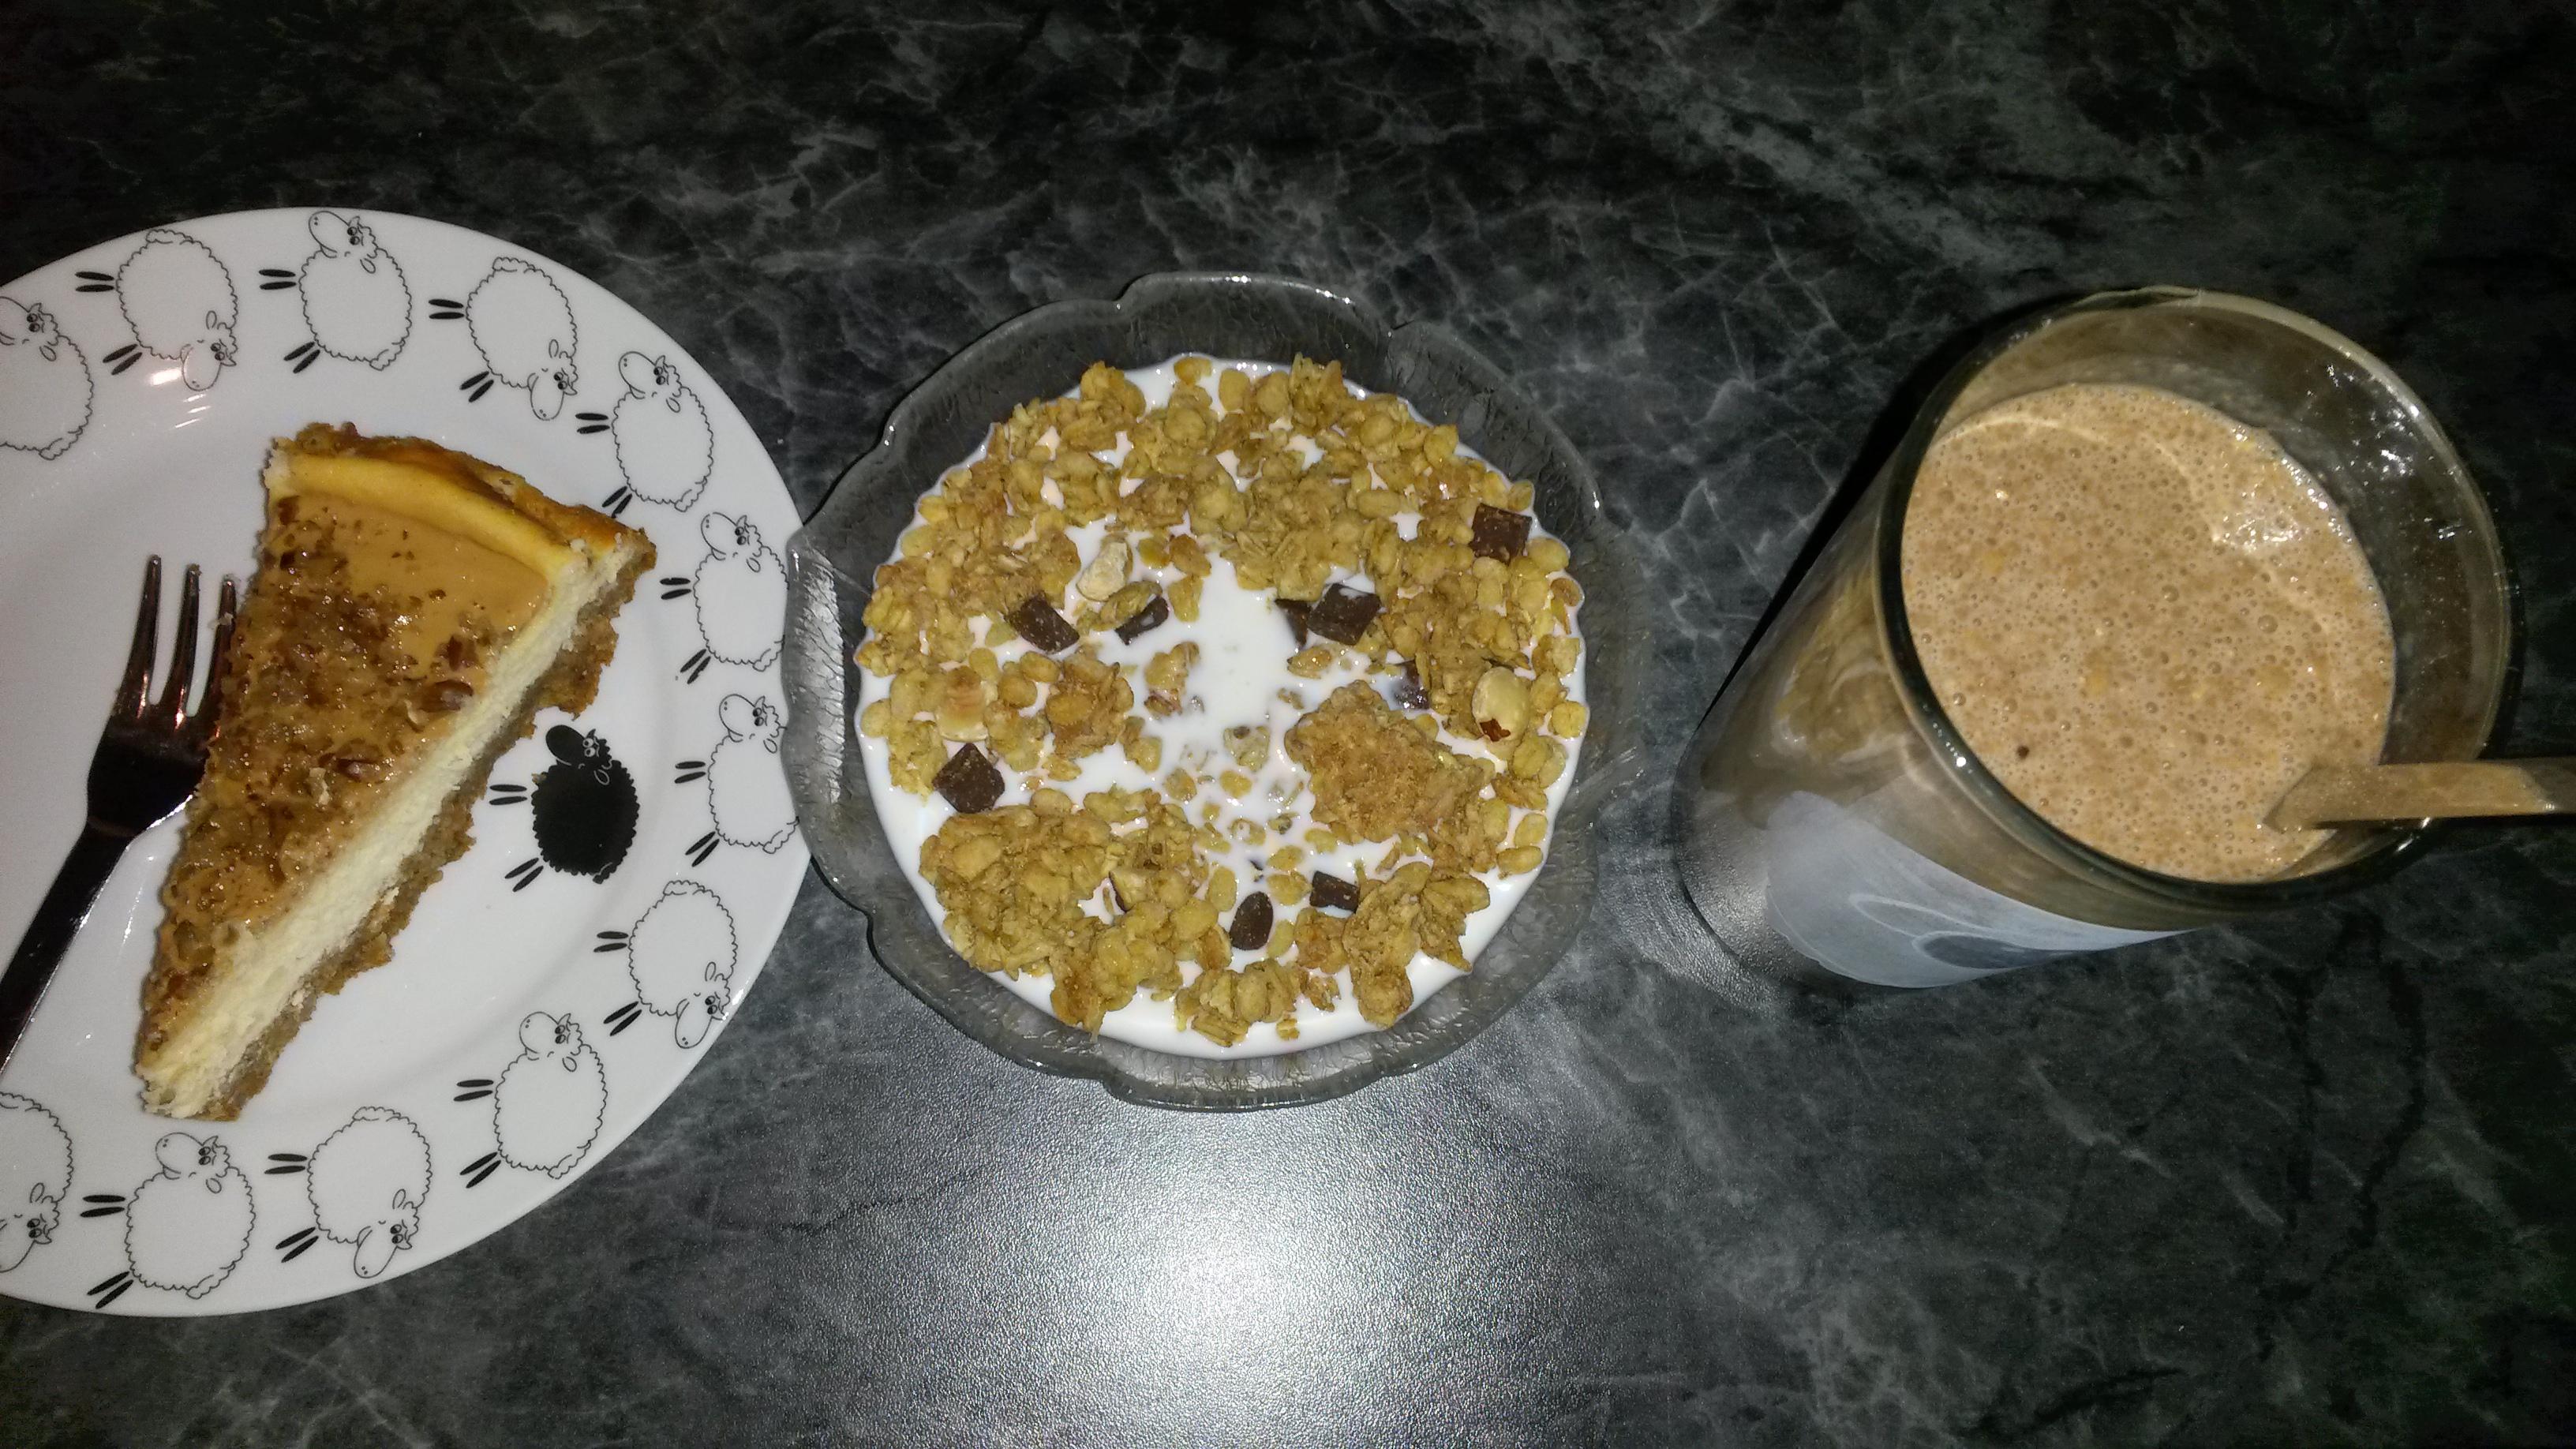 https://foodloader.net/sk0r_2014-02-18_Proteinshake_Muesli_Karamellkuchen.jpg